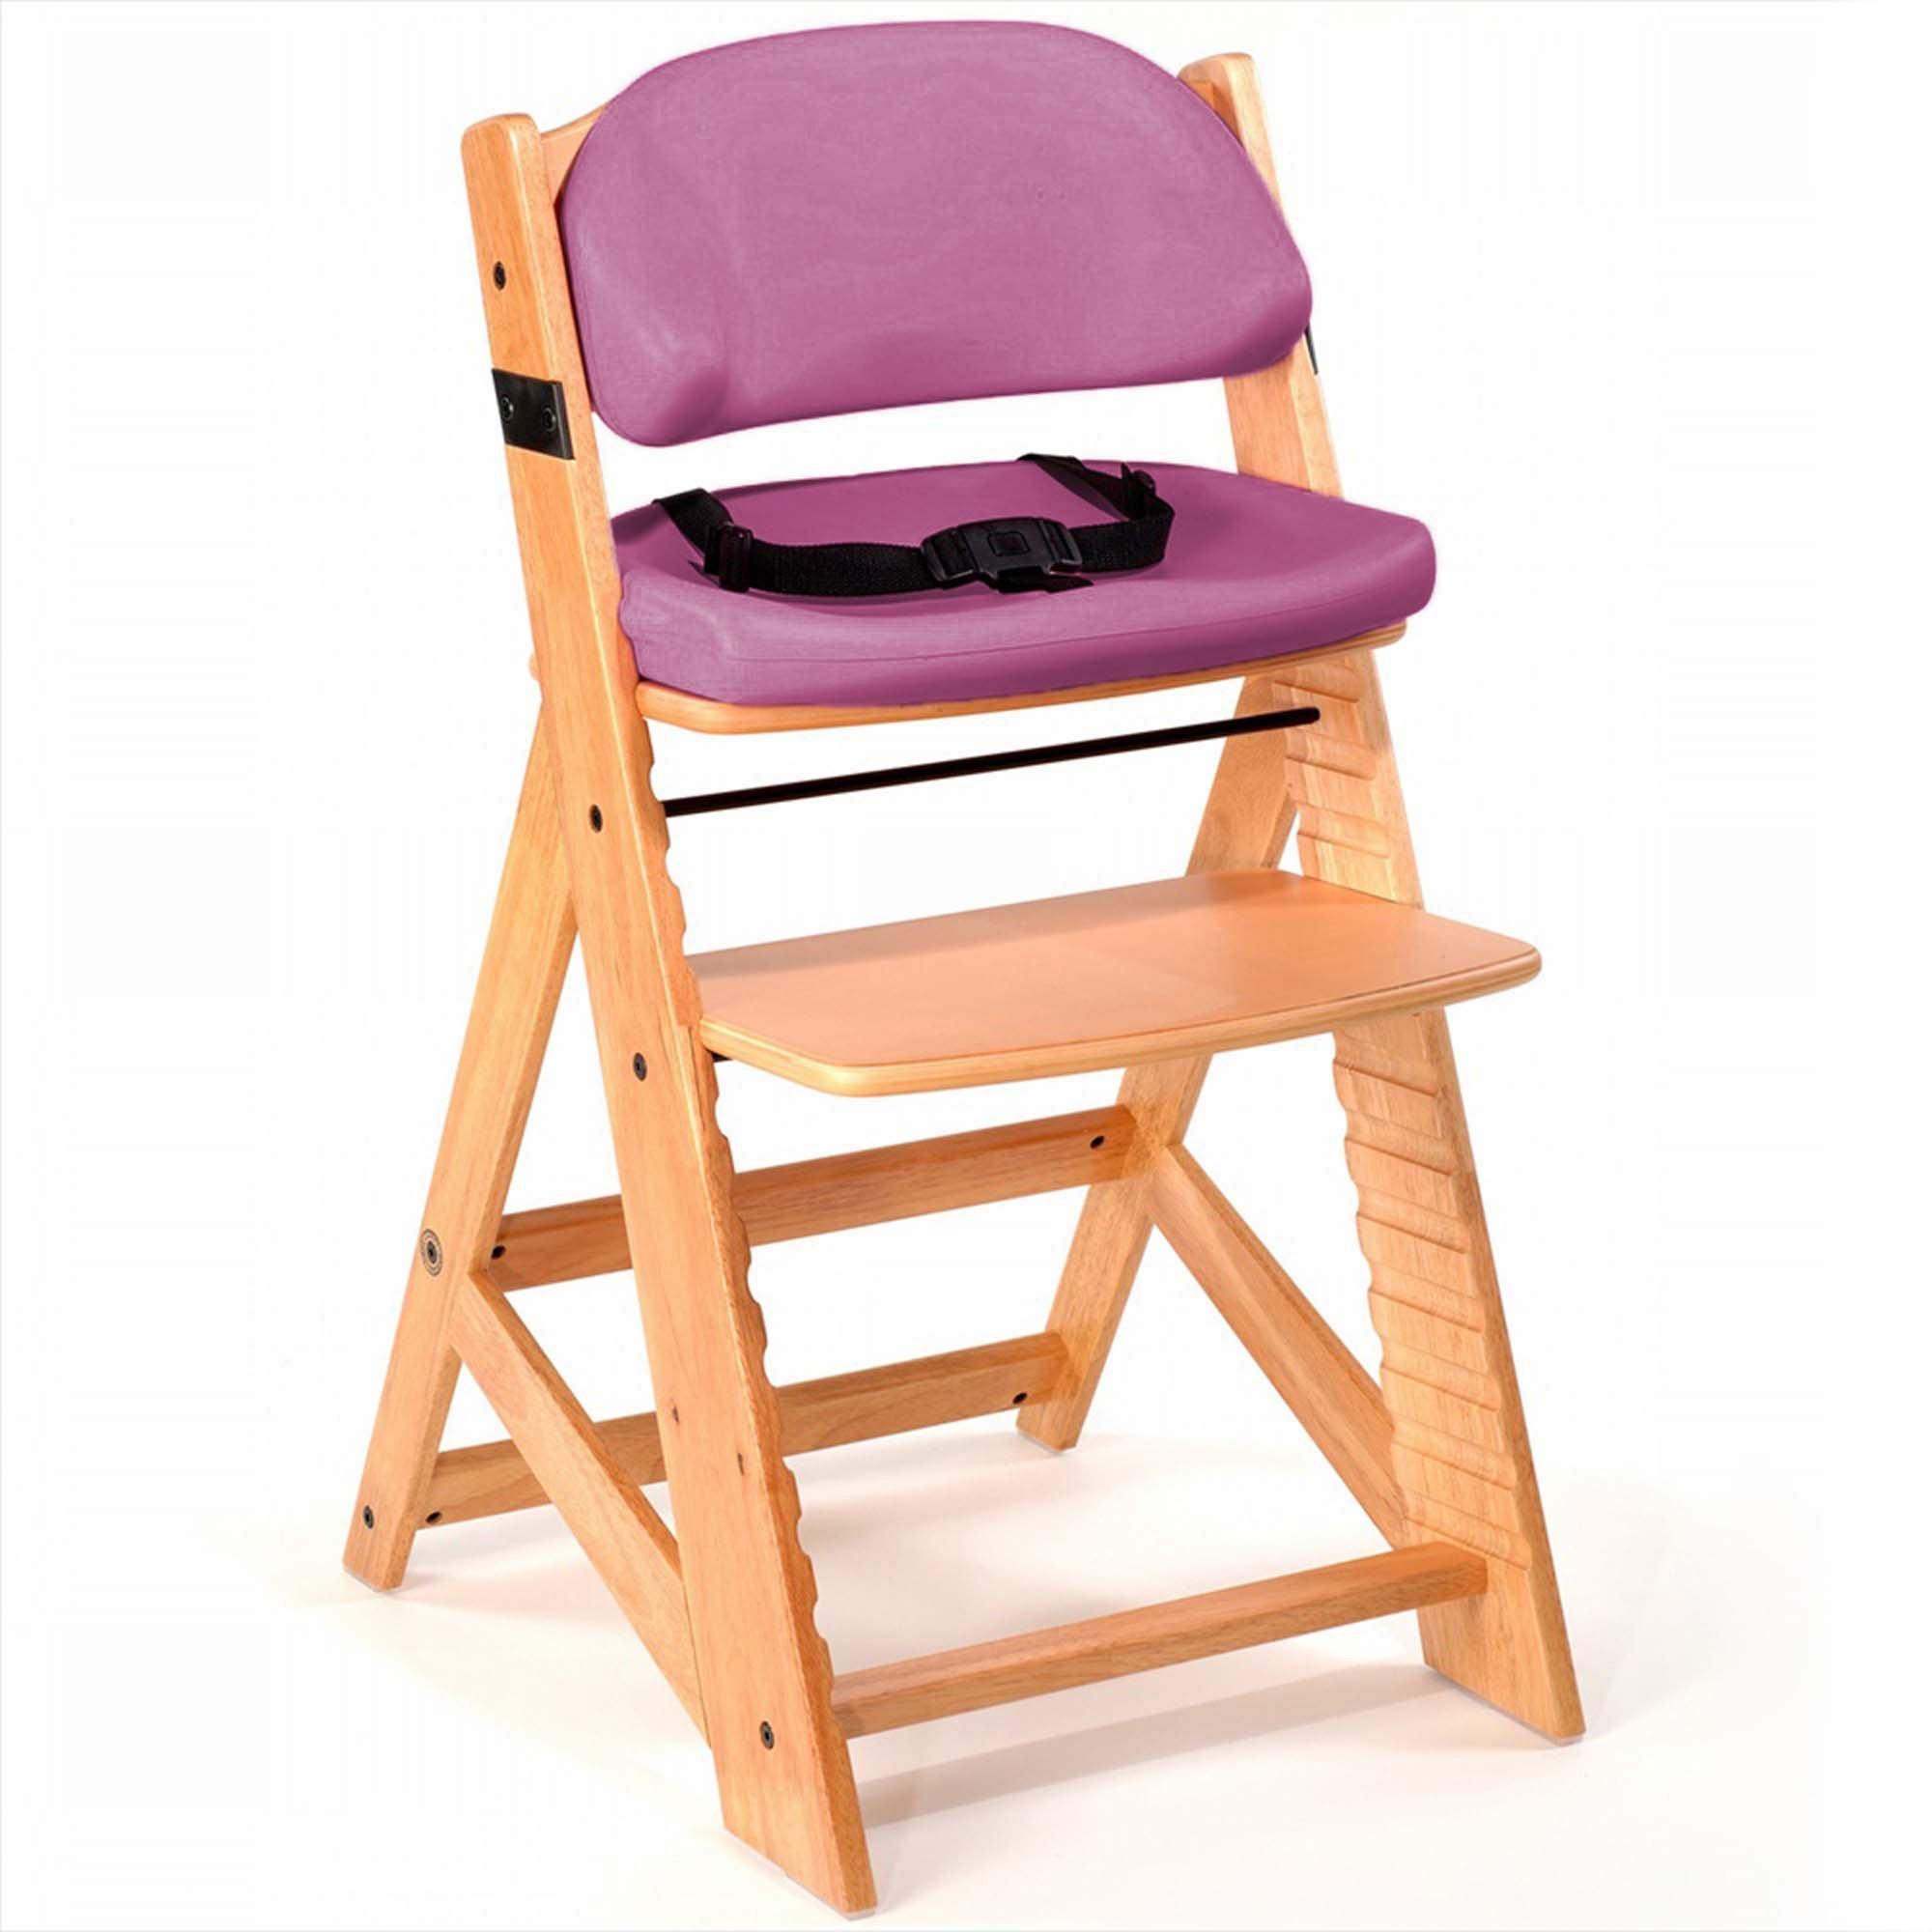 Keekaroo Height Right Kids Chair with Comfort Cushions, Raspberry